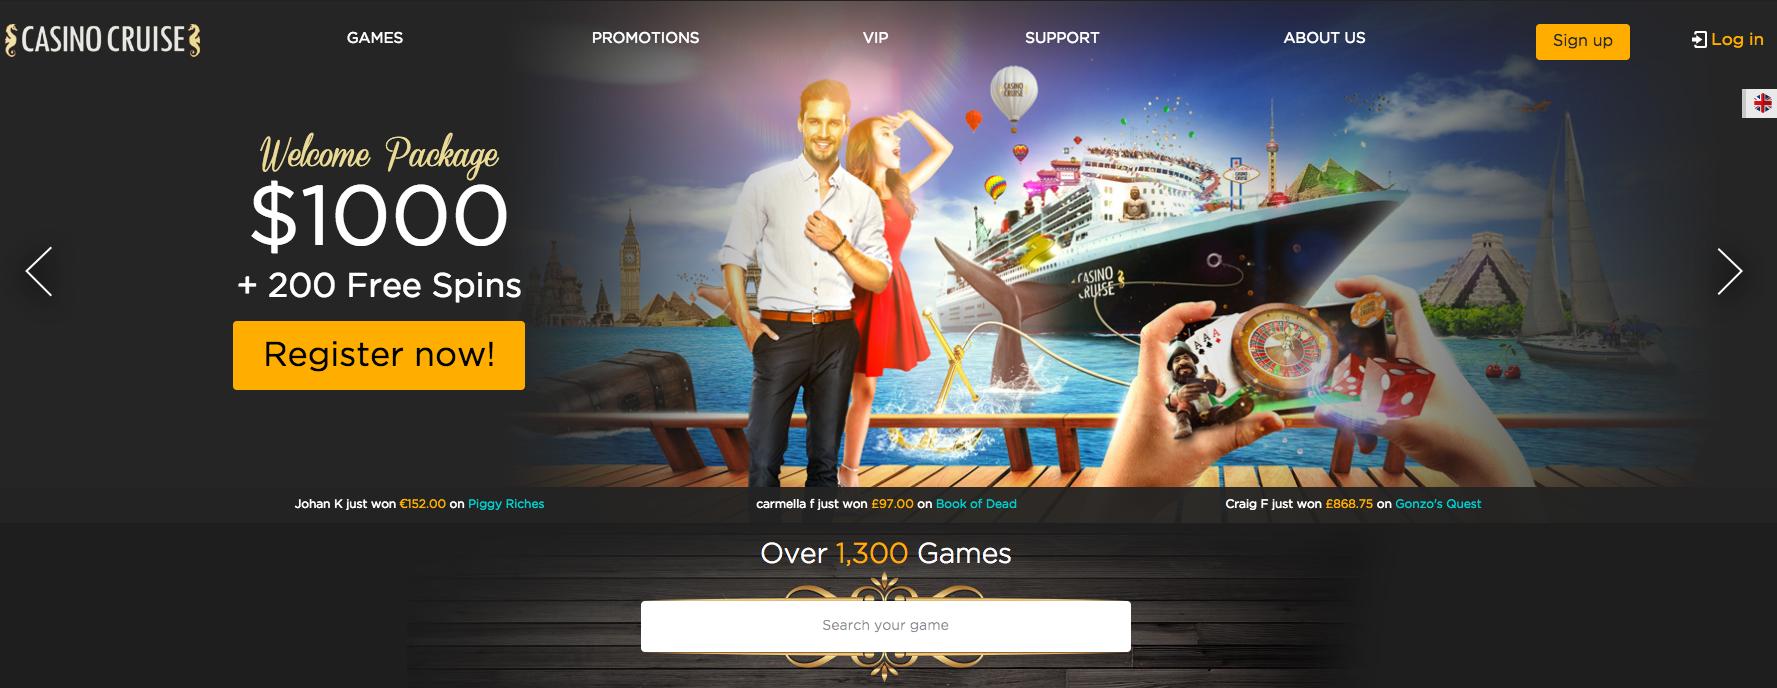 A screenshot of Casino Cruise casino gaming offers